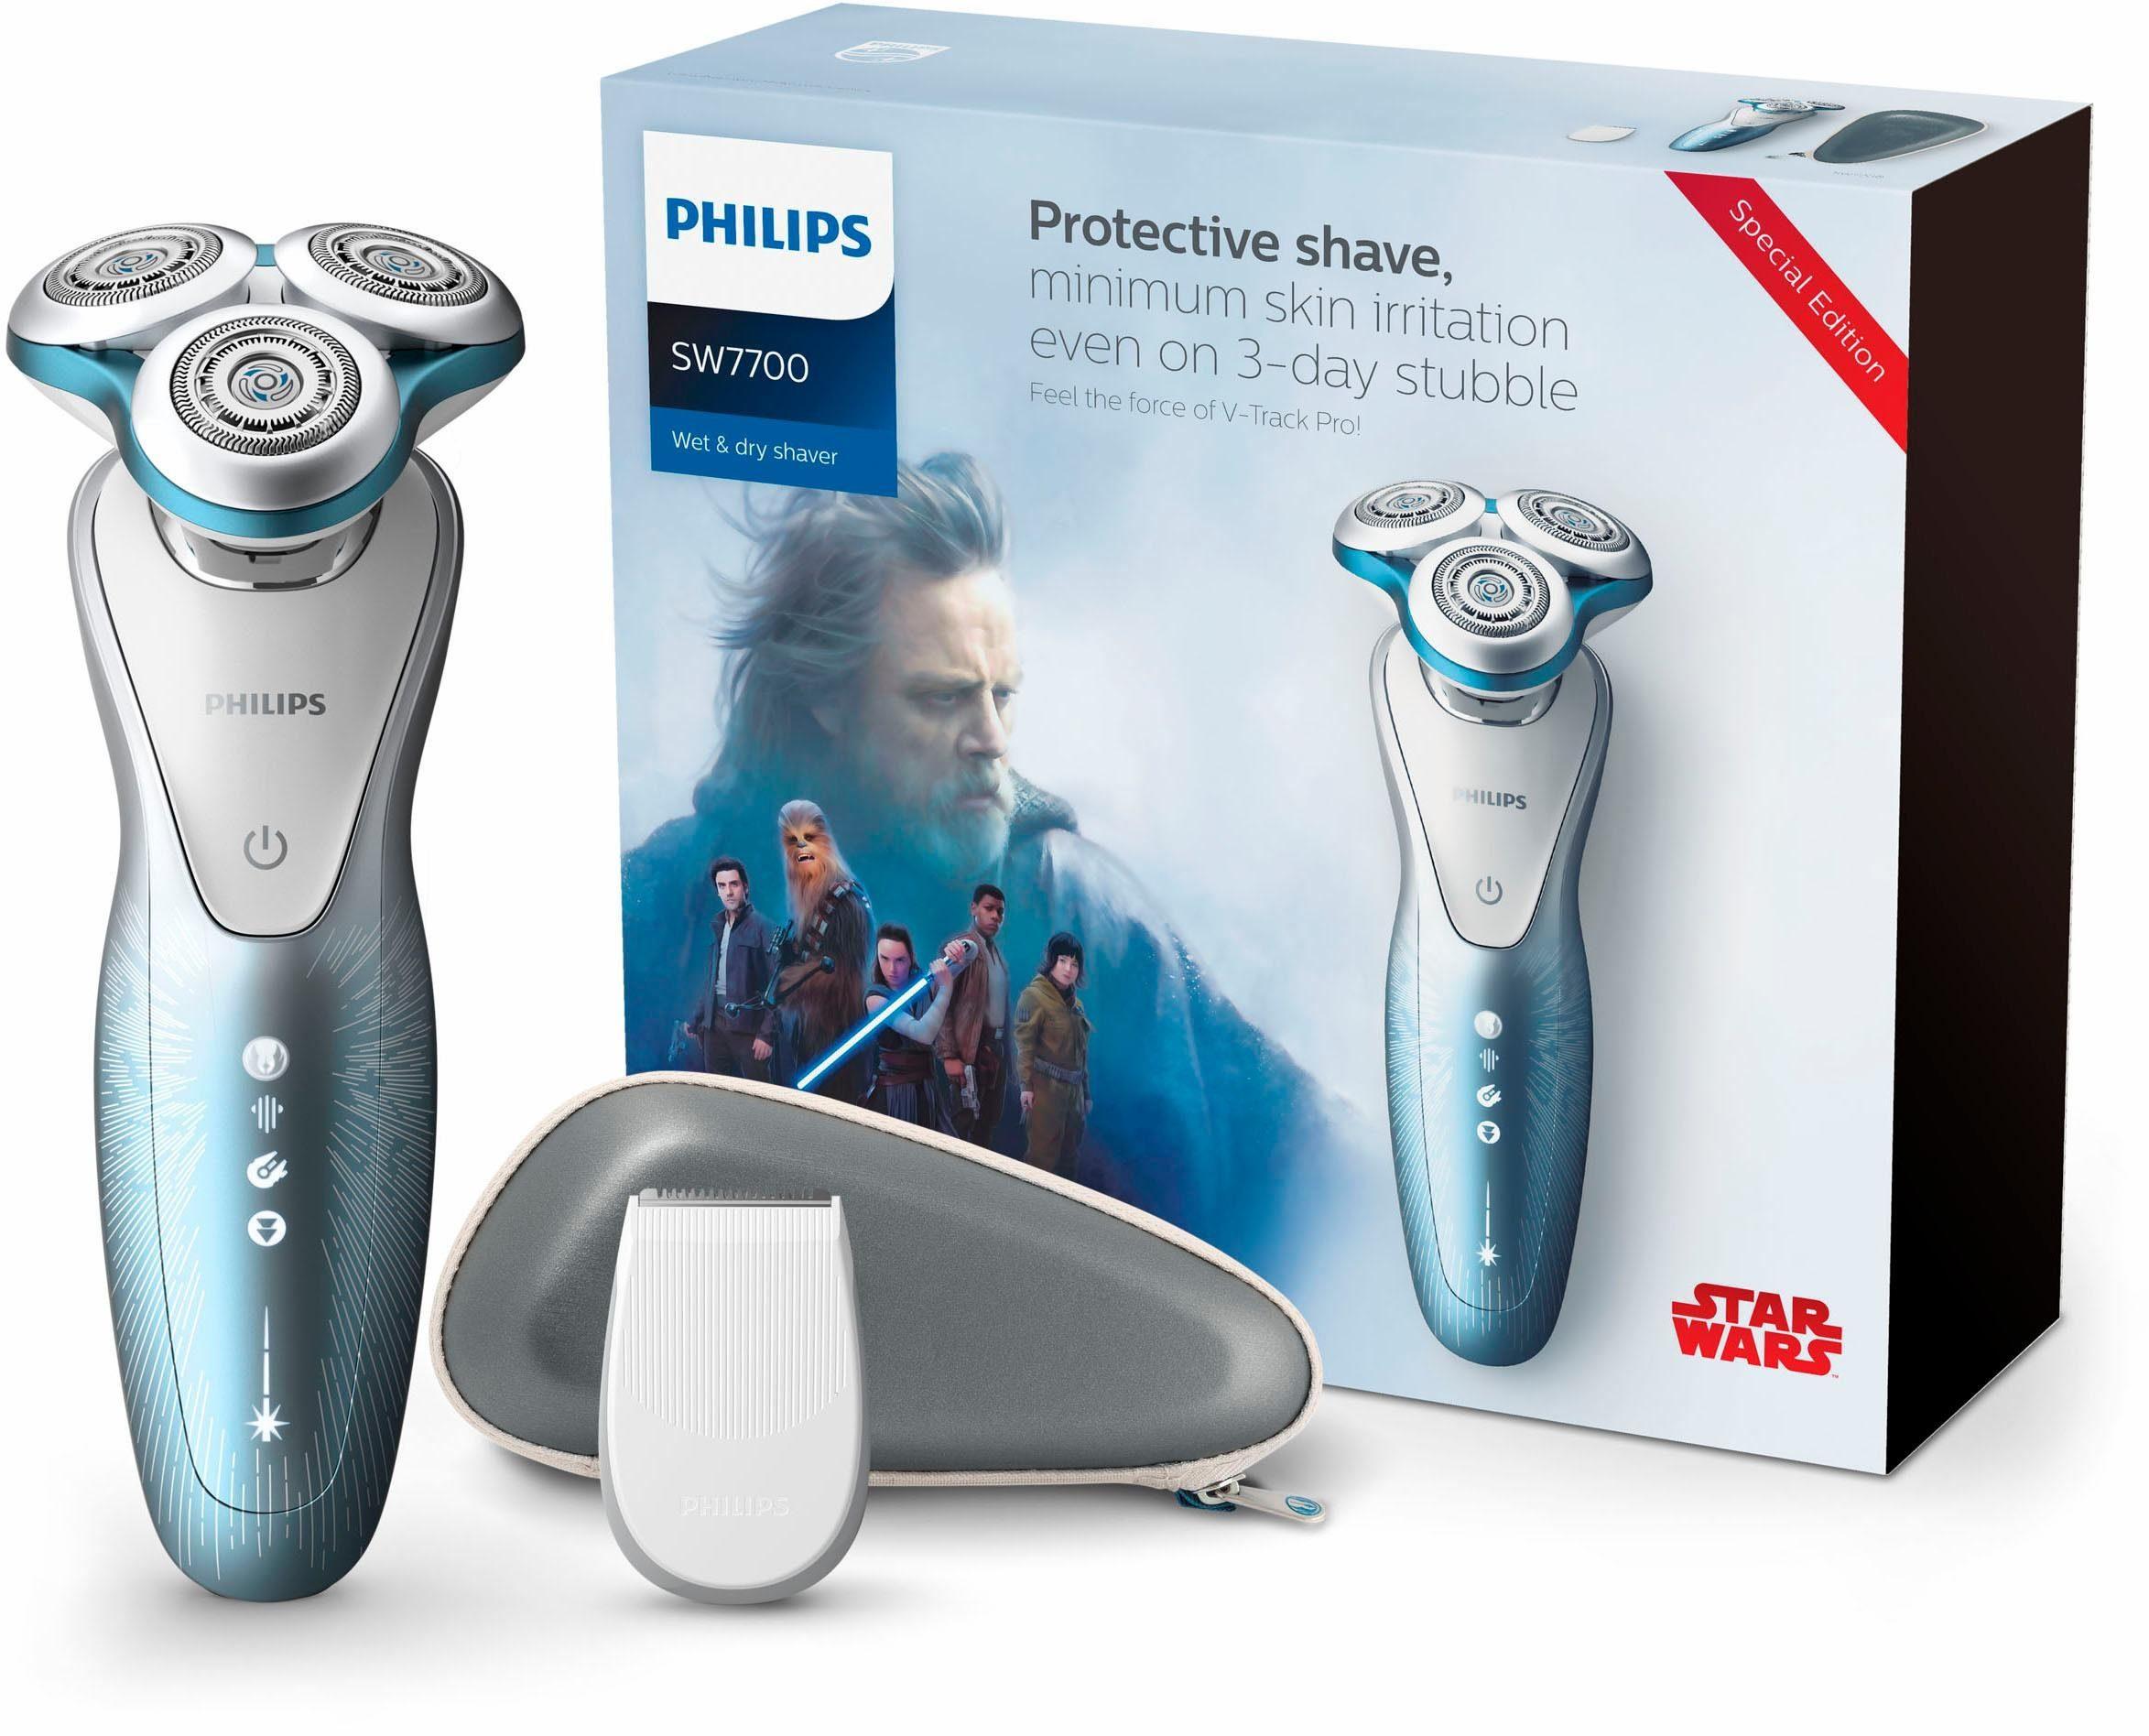 Philips Elektrorasierer Series 7000 - Luke Skywalker SW7700/67, Aufsätze: 1, Langhaartrimmer, inkl. Etui, Special Edition in hochwertiger Geschenkverpackung